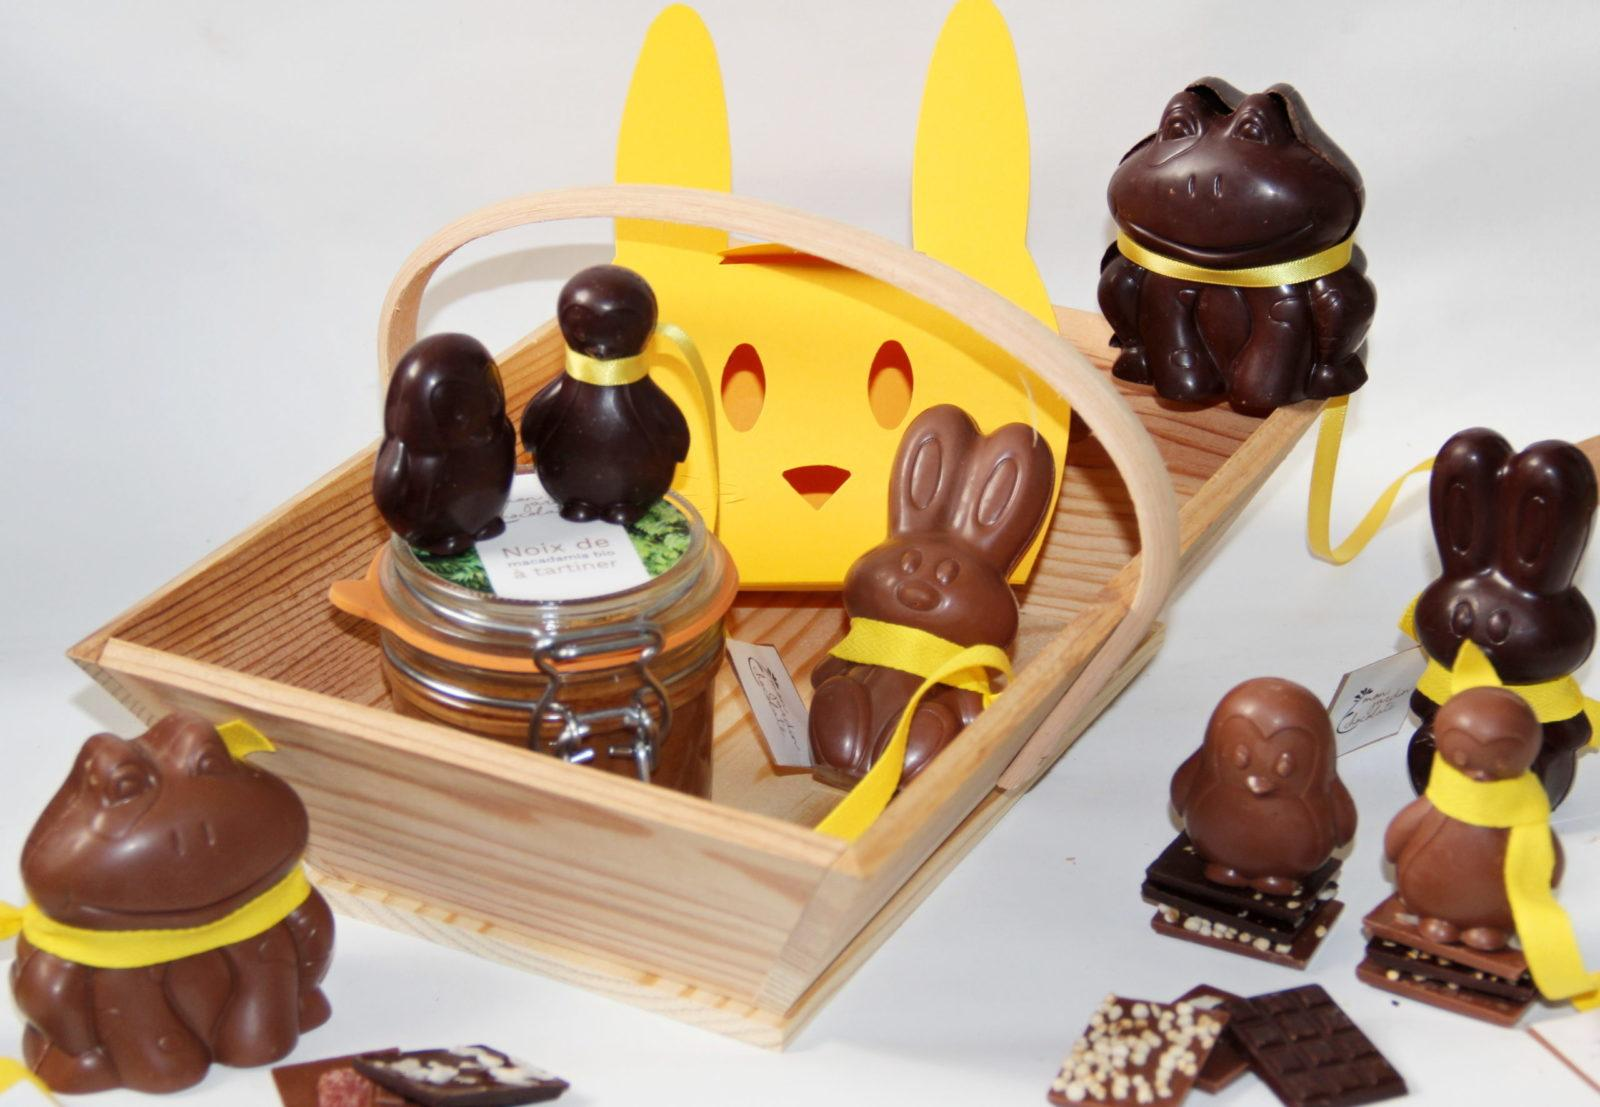 livraisons de chocolats de Pâques - jardin chocolaté paris